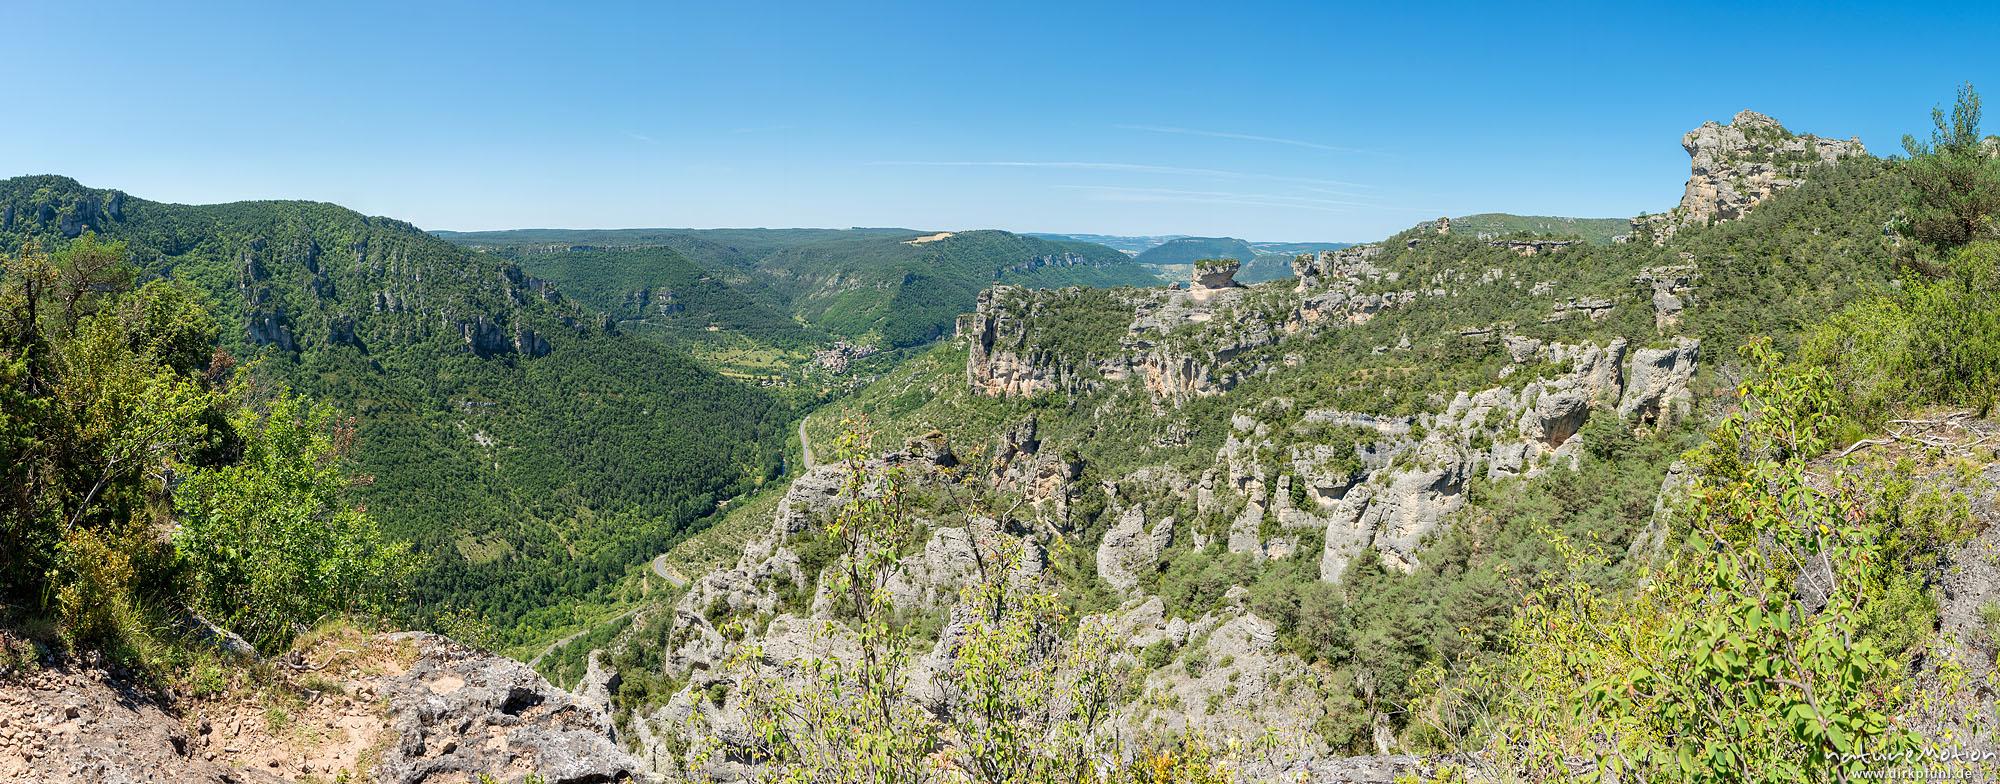 Felsformationen, Tal der Jonte, Felswanderung Schluchtenwelt bei le Rozier, Gorges de la Jonte, Le Rozier, Frankreich